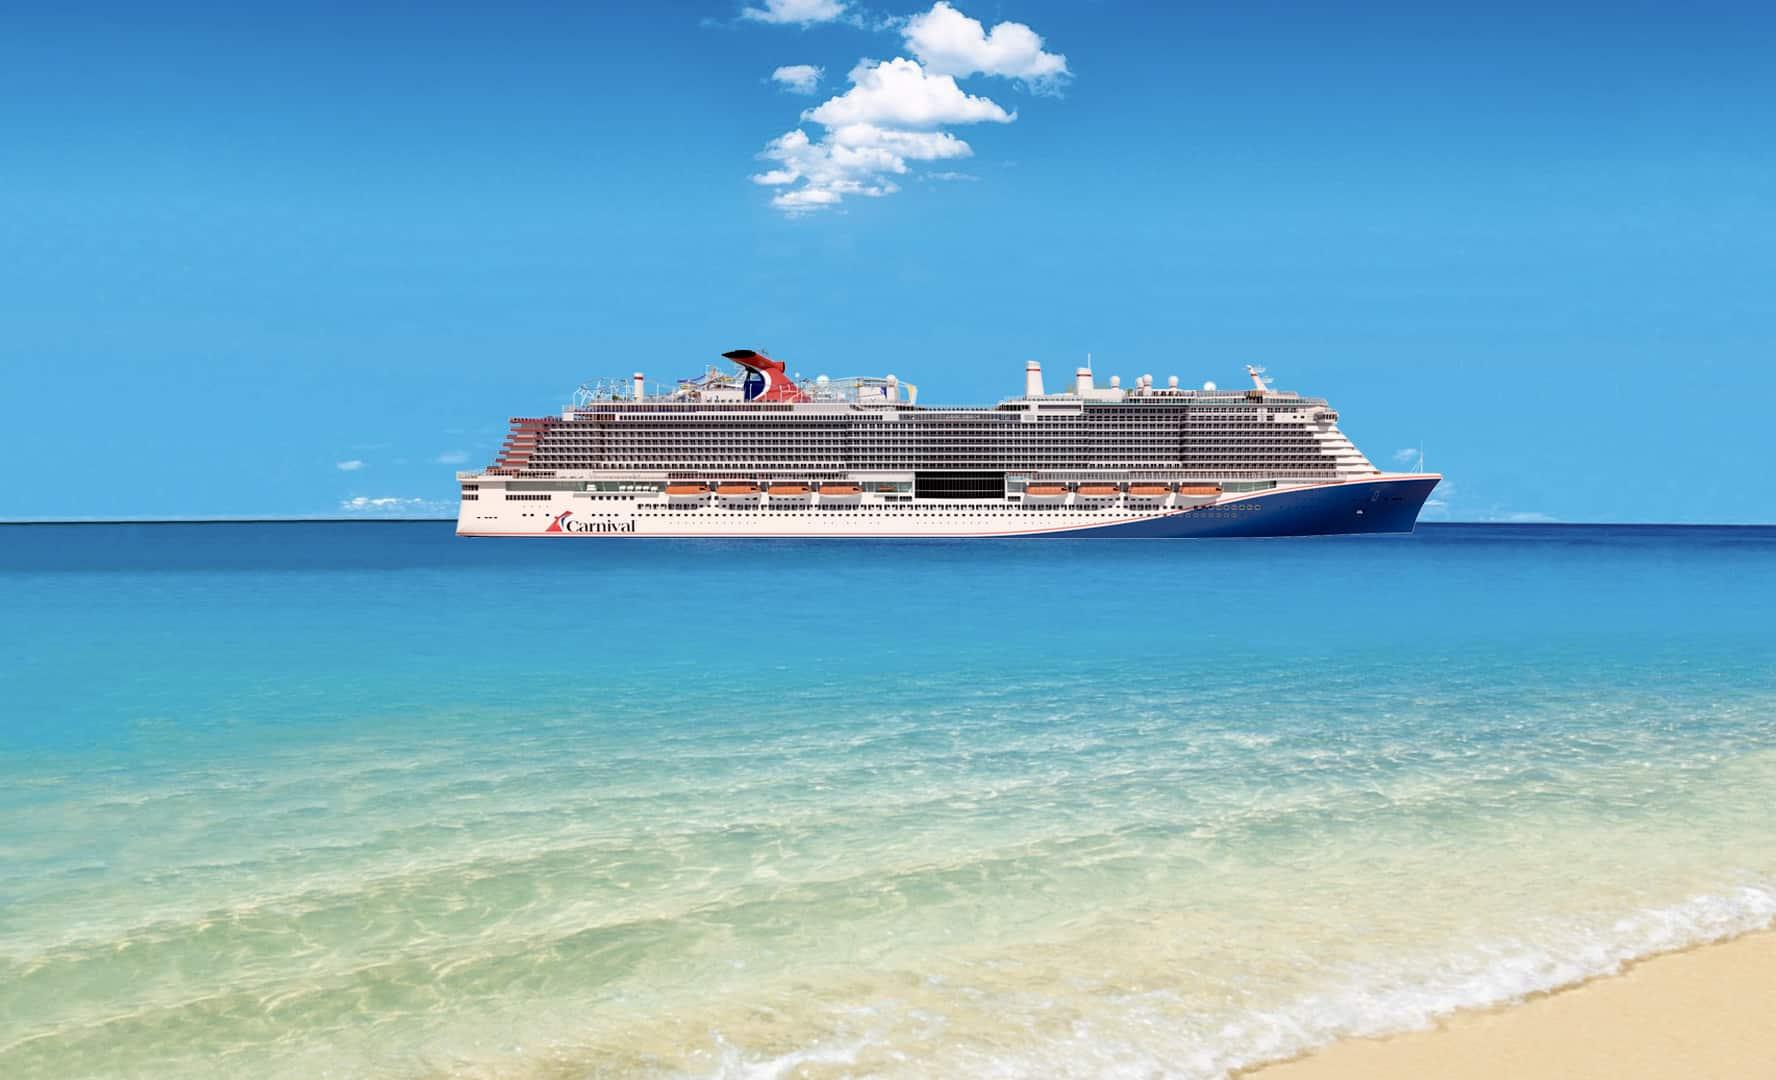 carnival cruise aida cruises new ship rendering